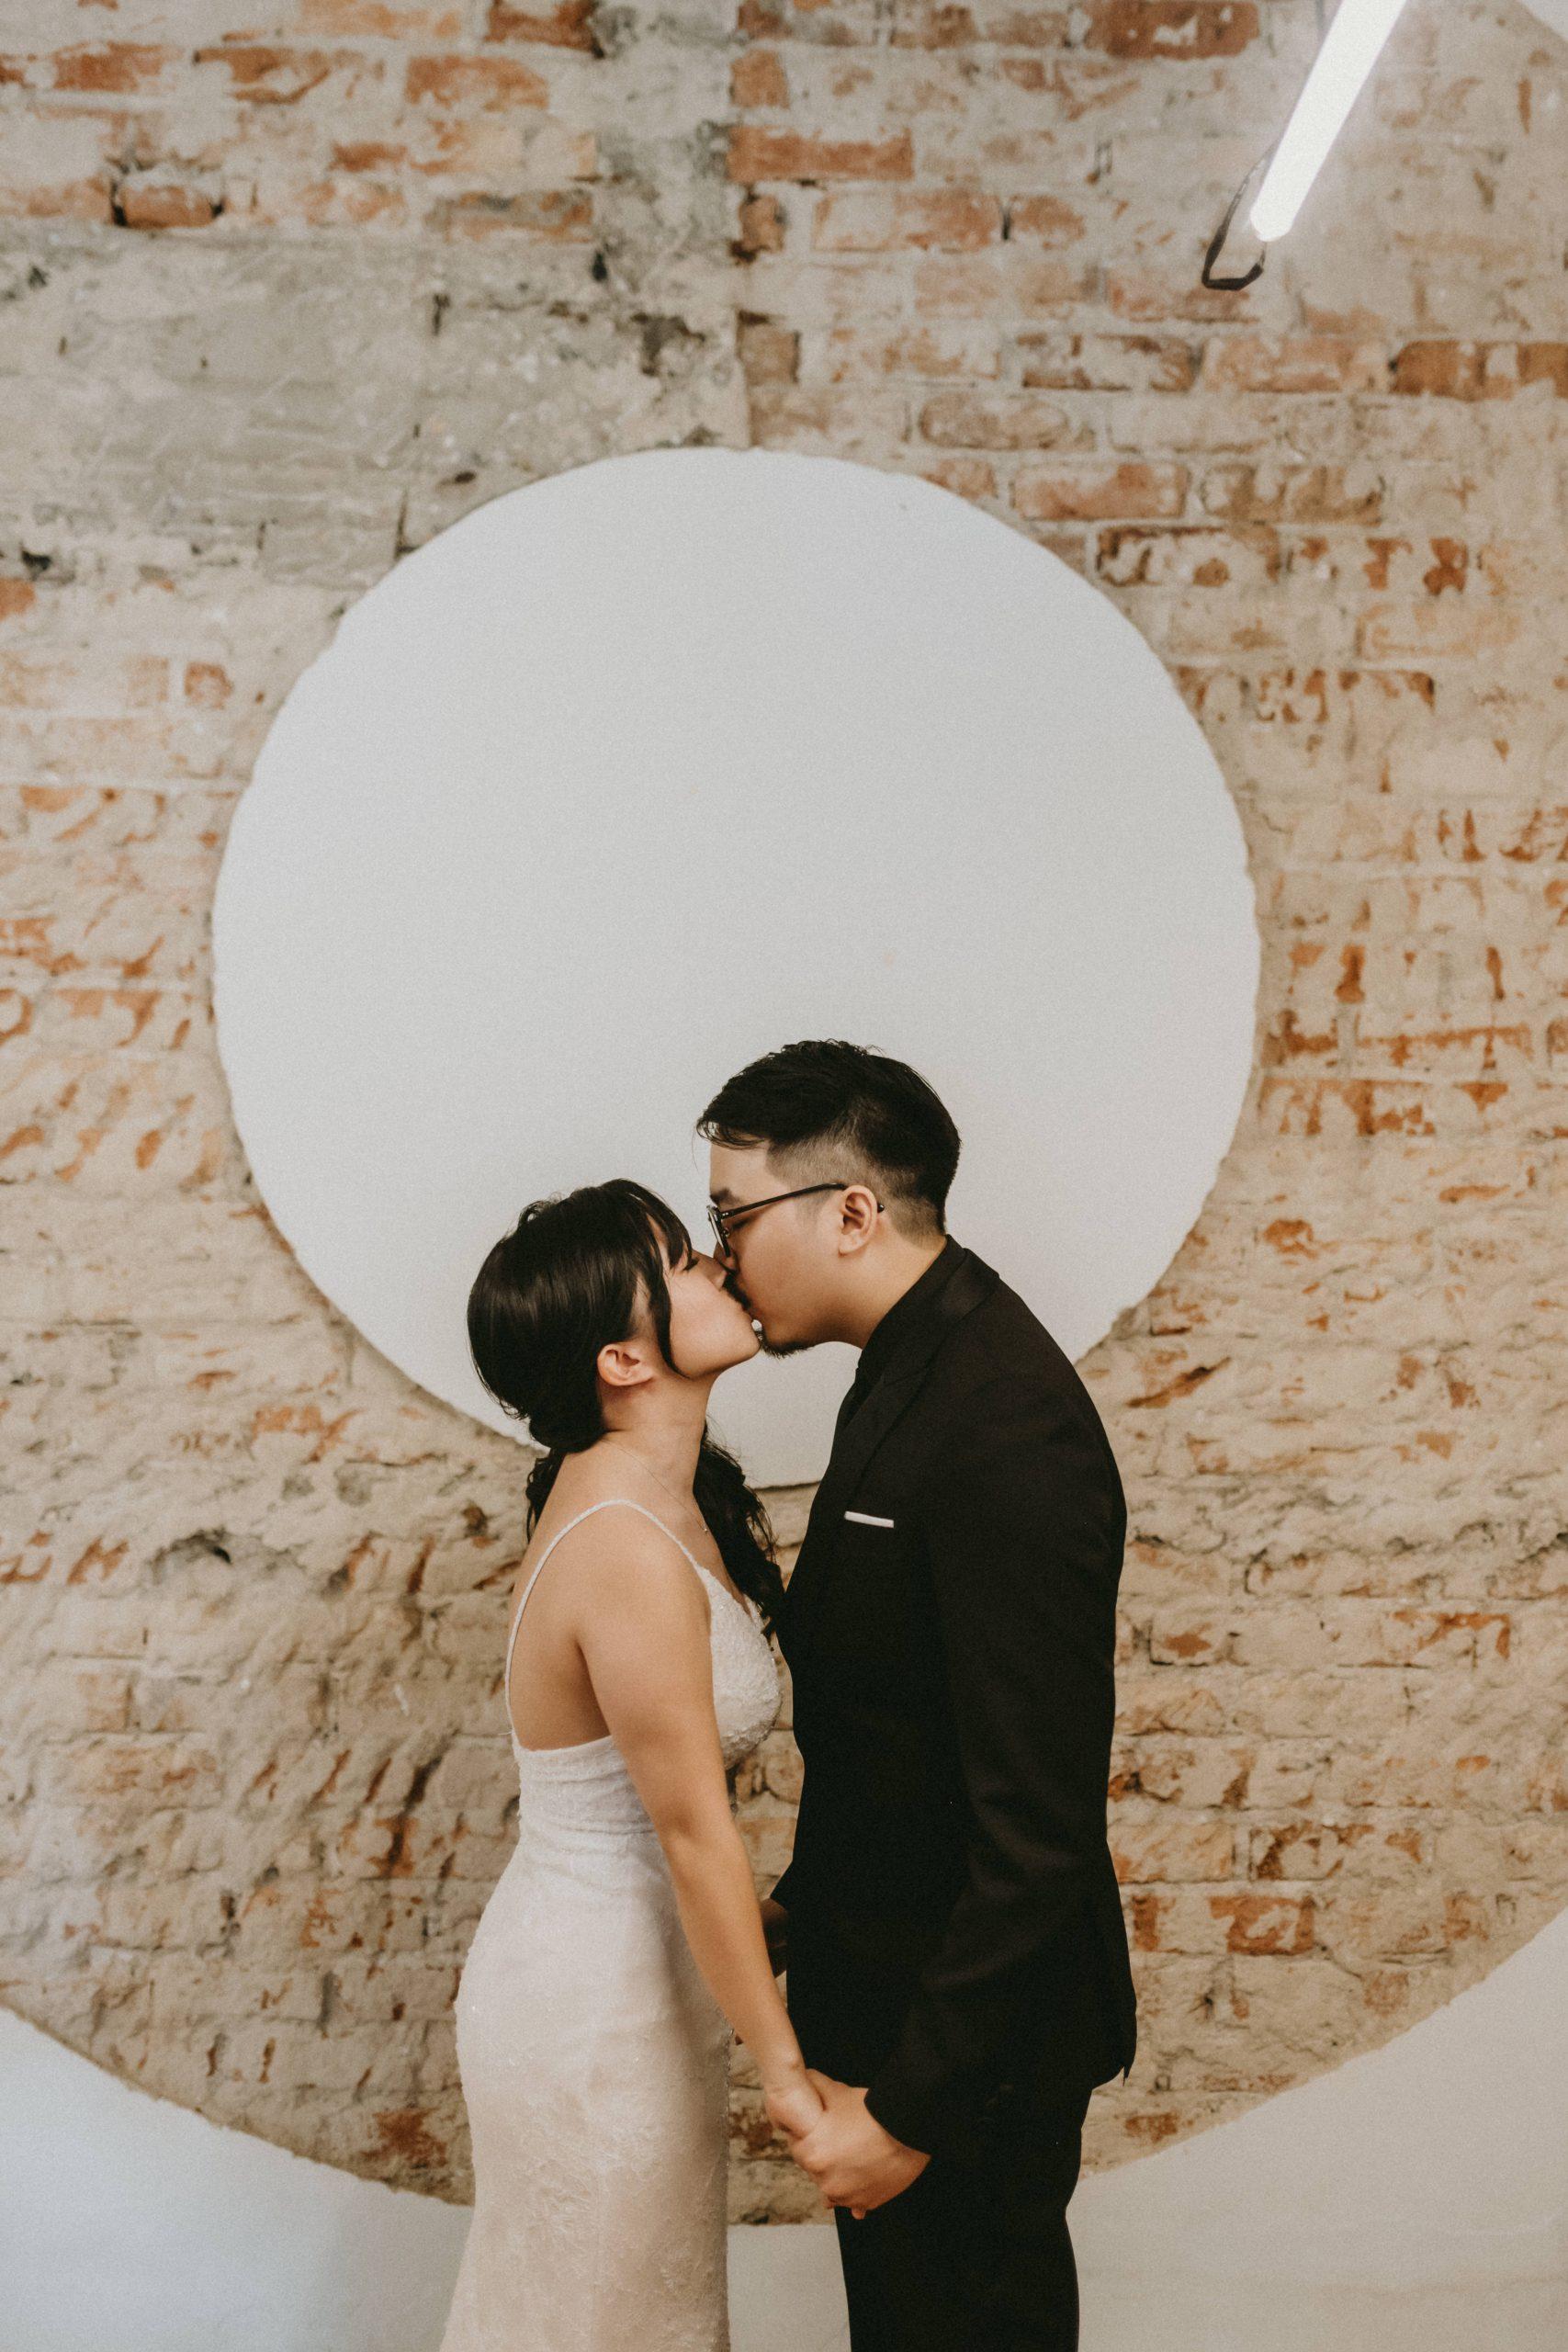 TREES ON THE MOON - Wedding photography